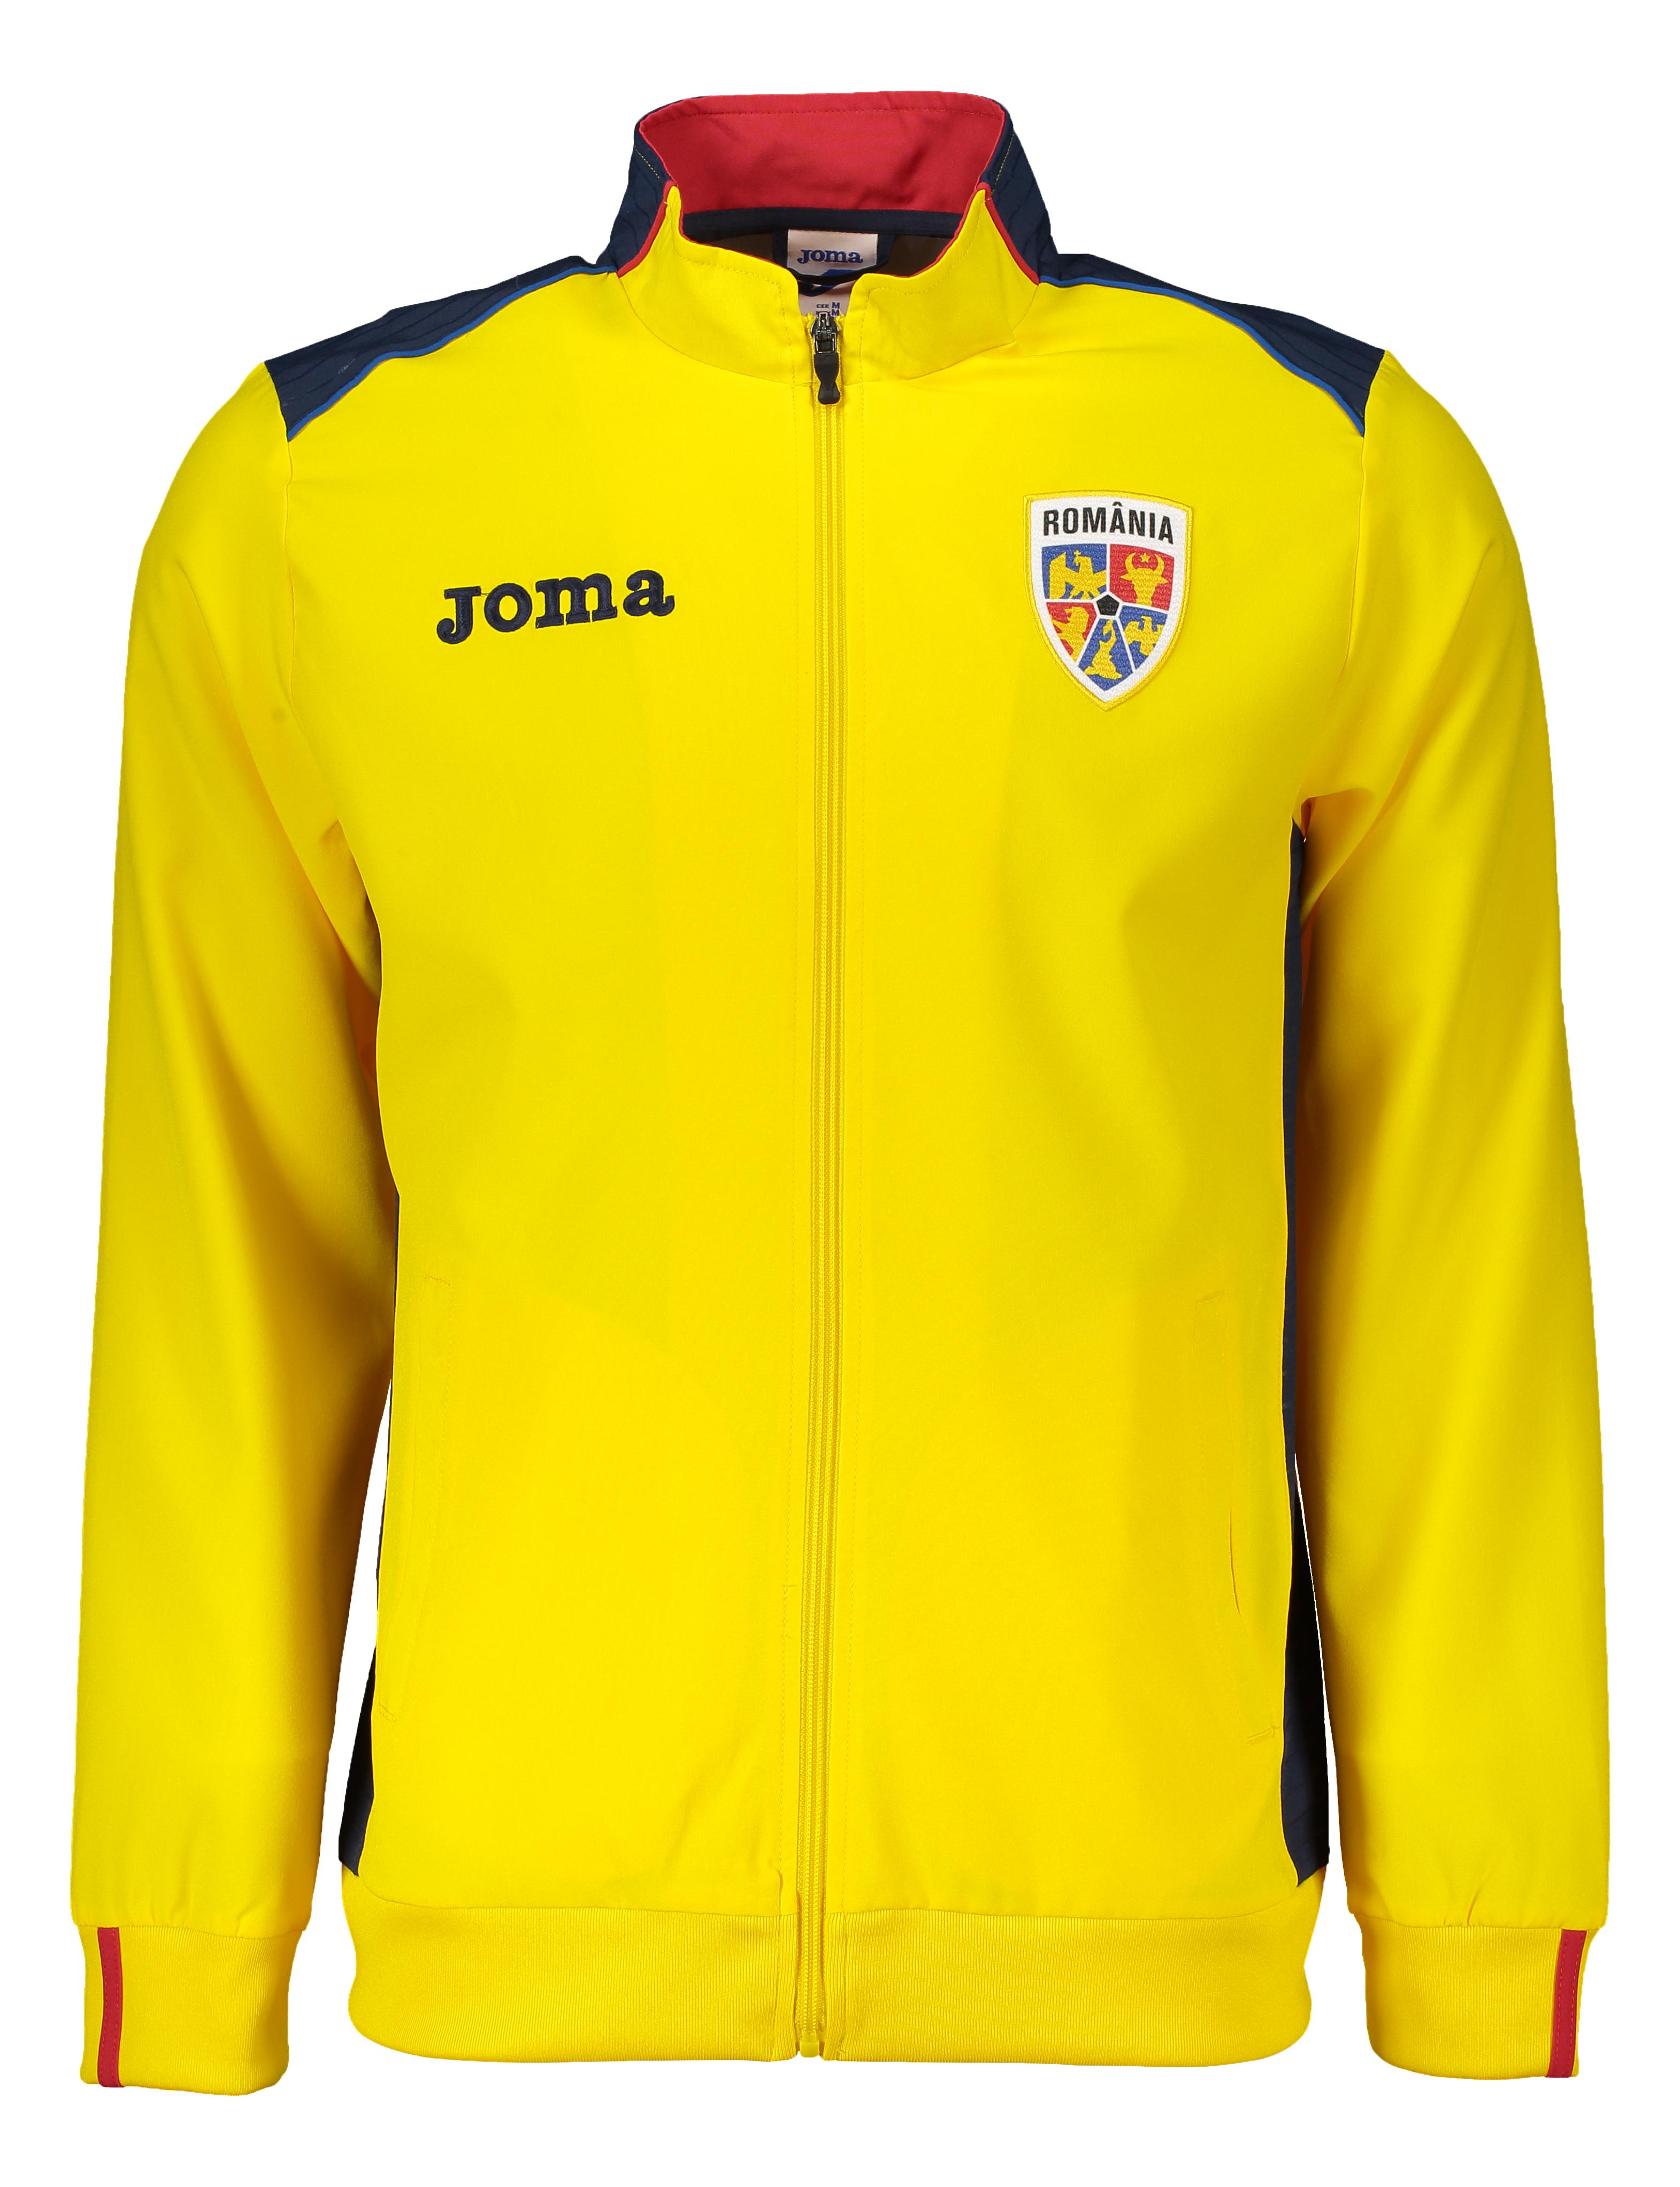 Bluza trening de prezentare a echipei nationale de fotbal Joma